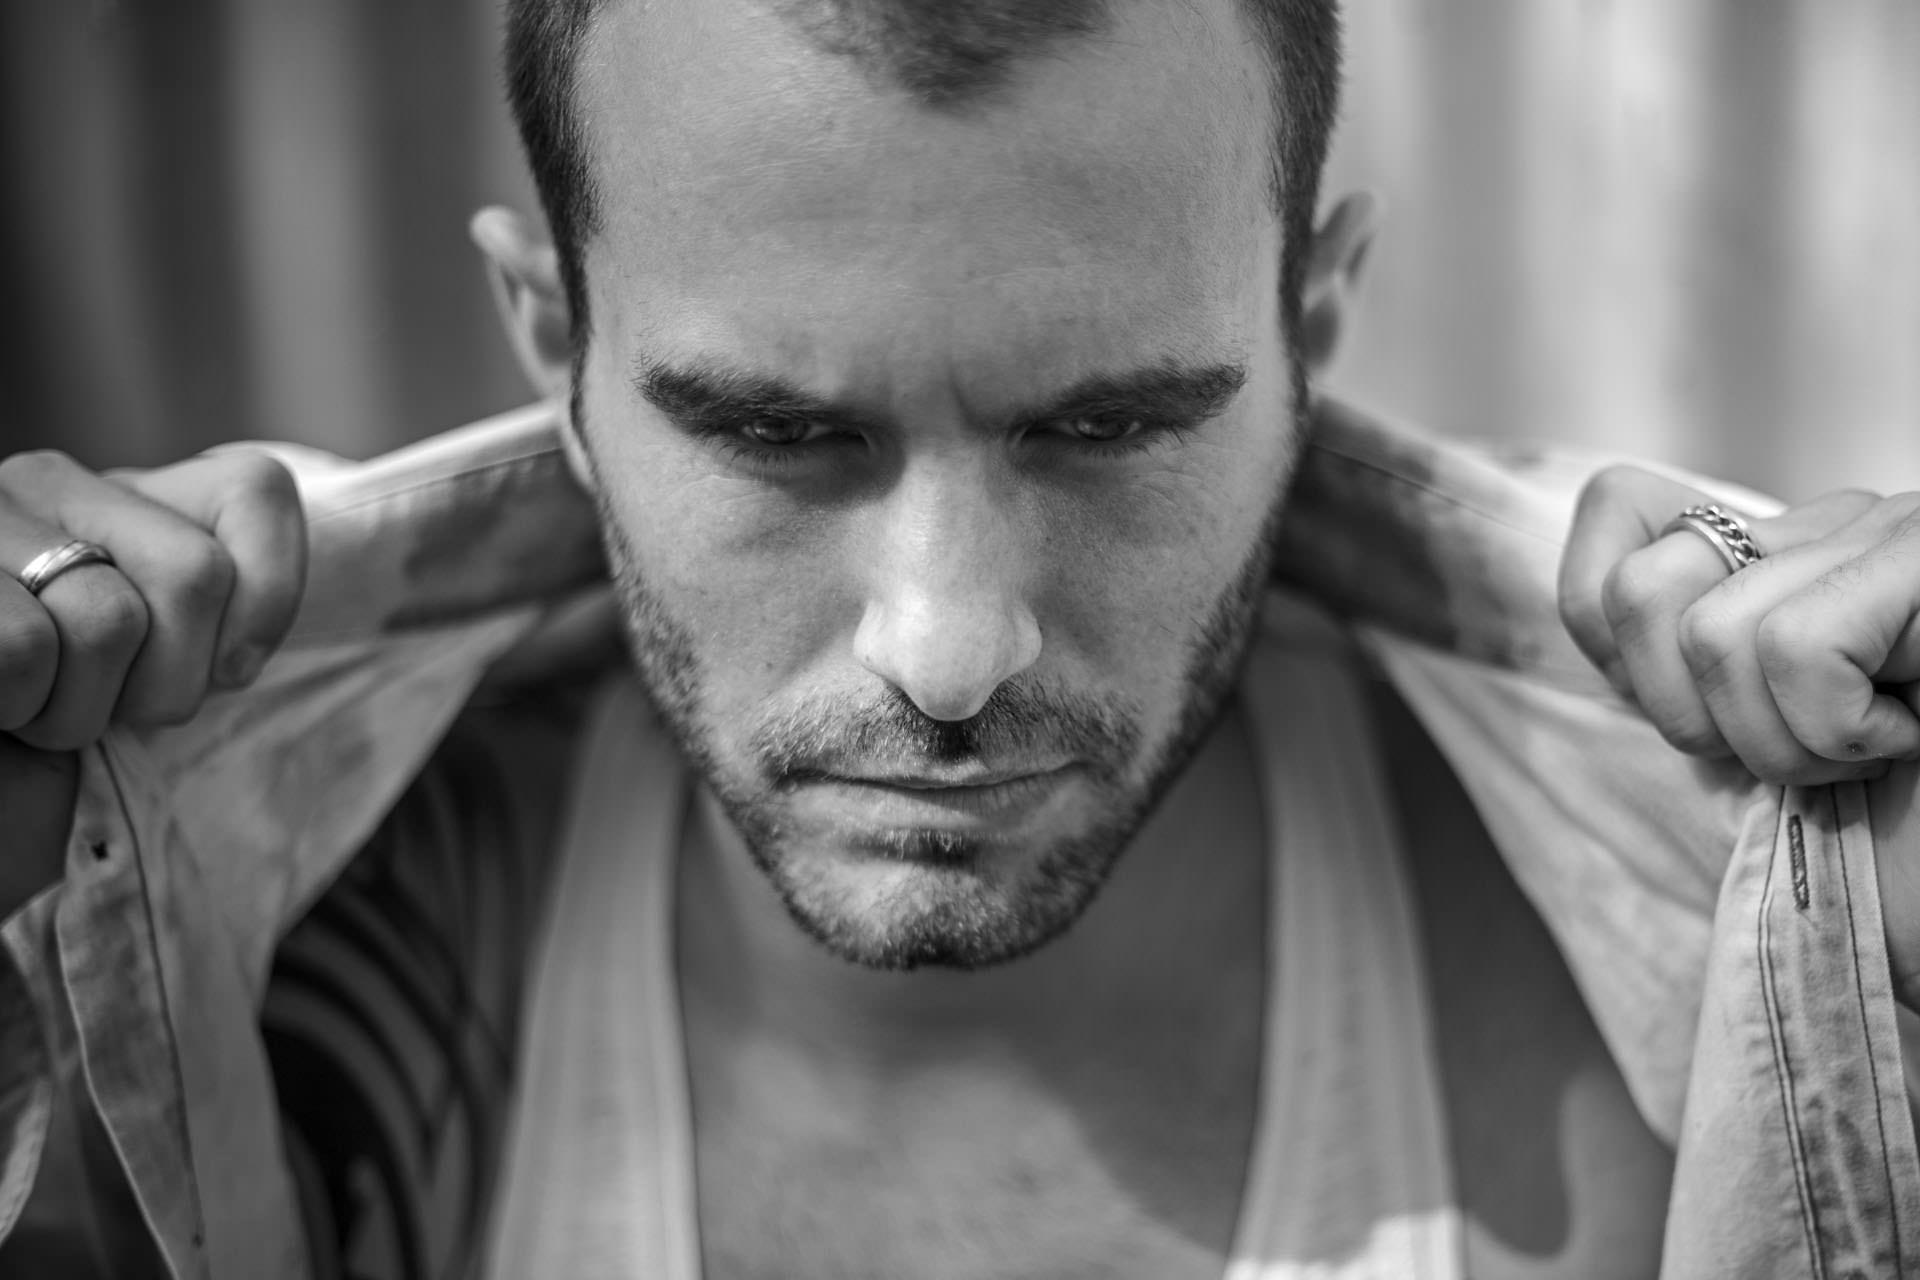 2012-06-22 - Jonathan Bogdanovic - Cerny - 7492 - 1920px